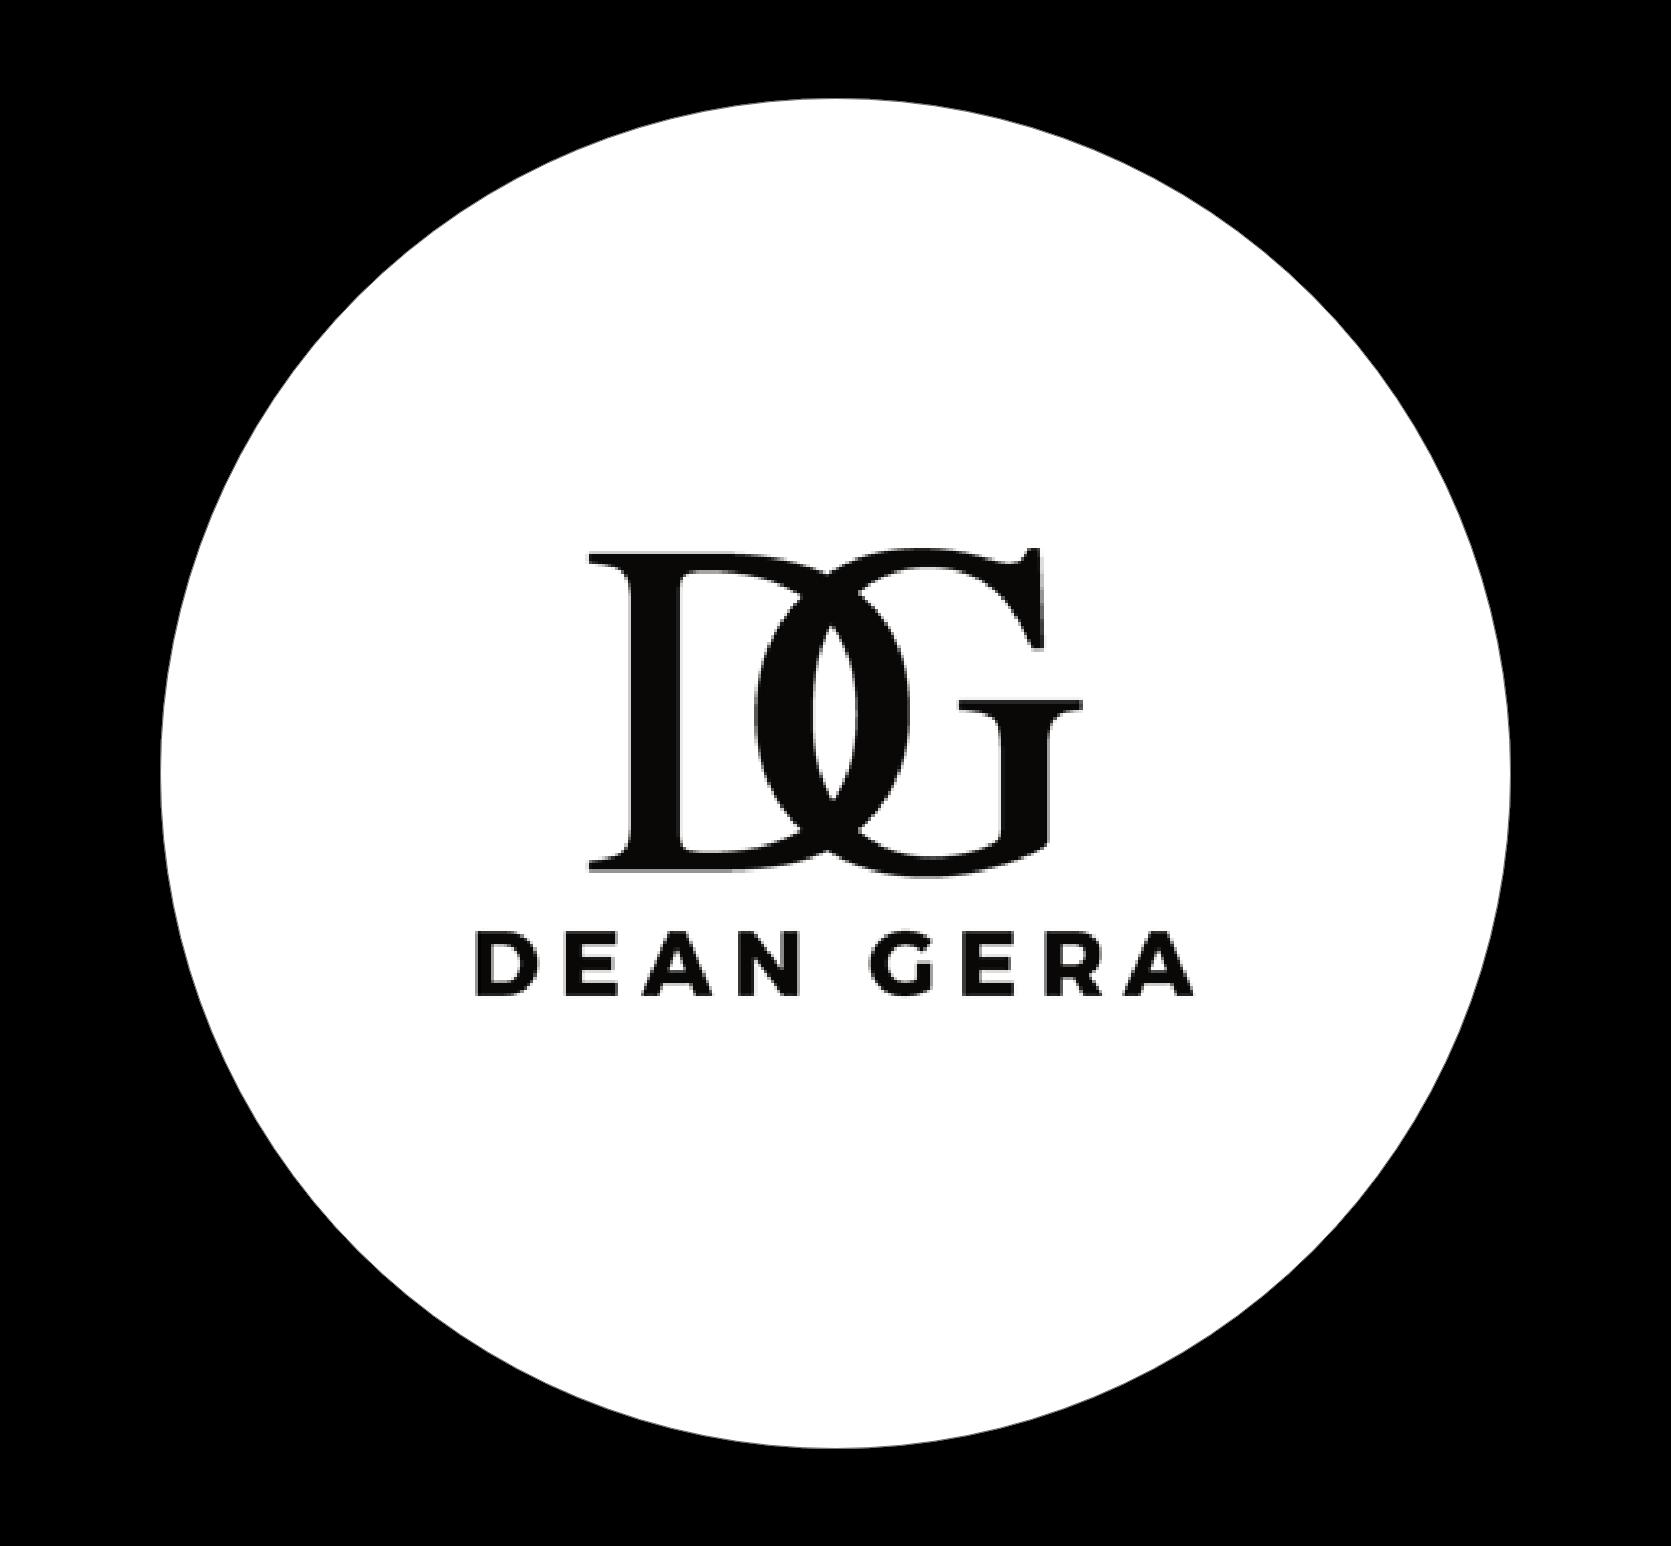 Dean Gera